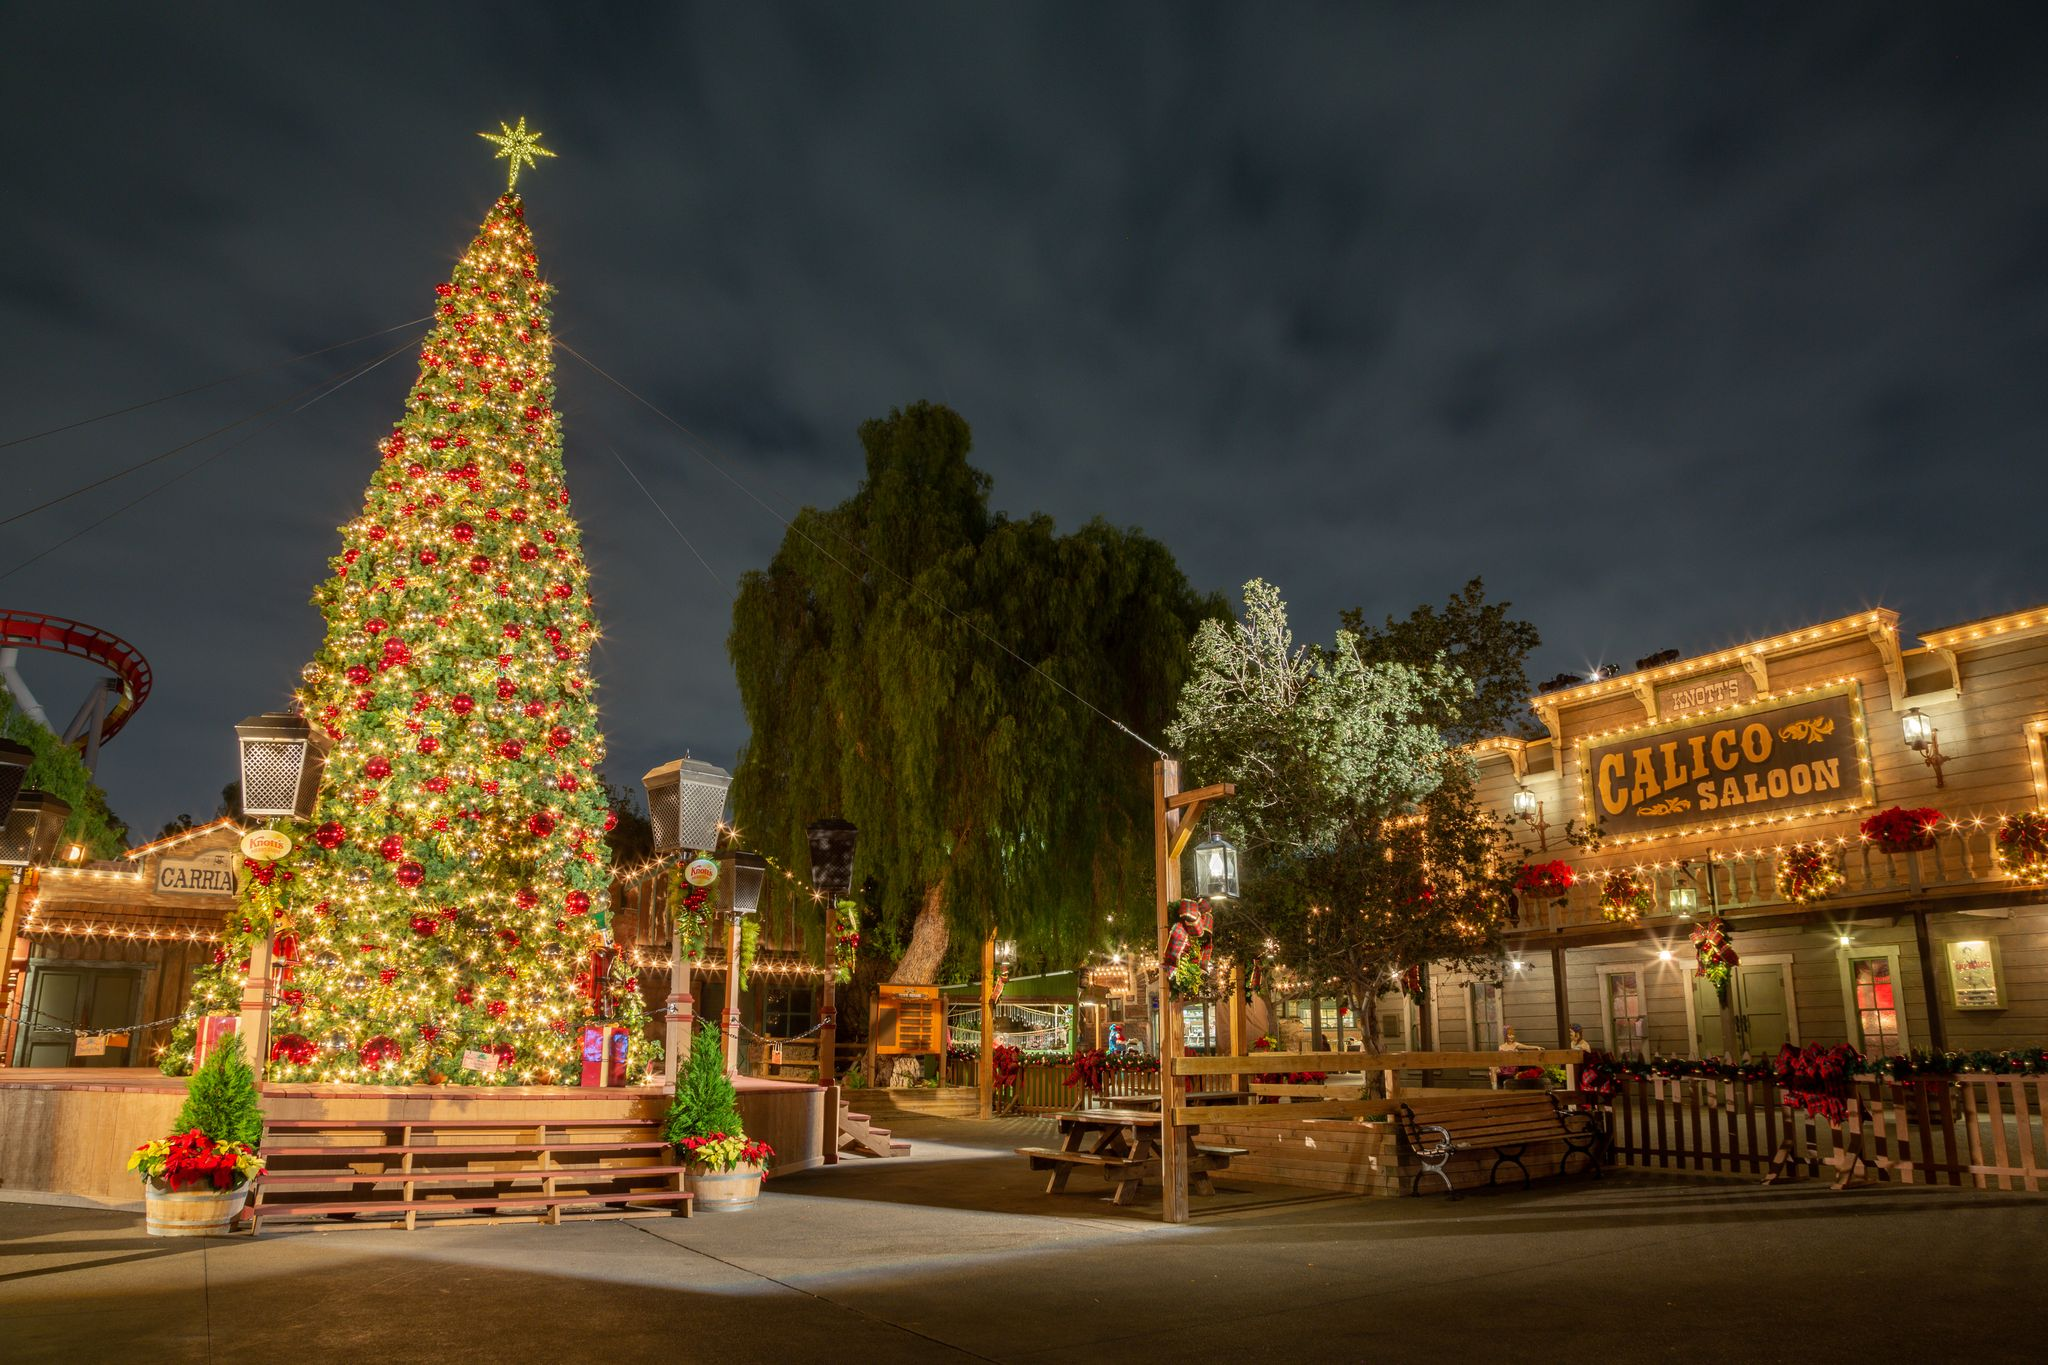 Knott S Berry Farm Celebrates The Holidays With The All New Knott S Taste Of Merry Farm Inside Universal